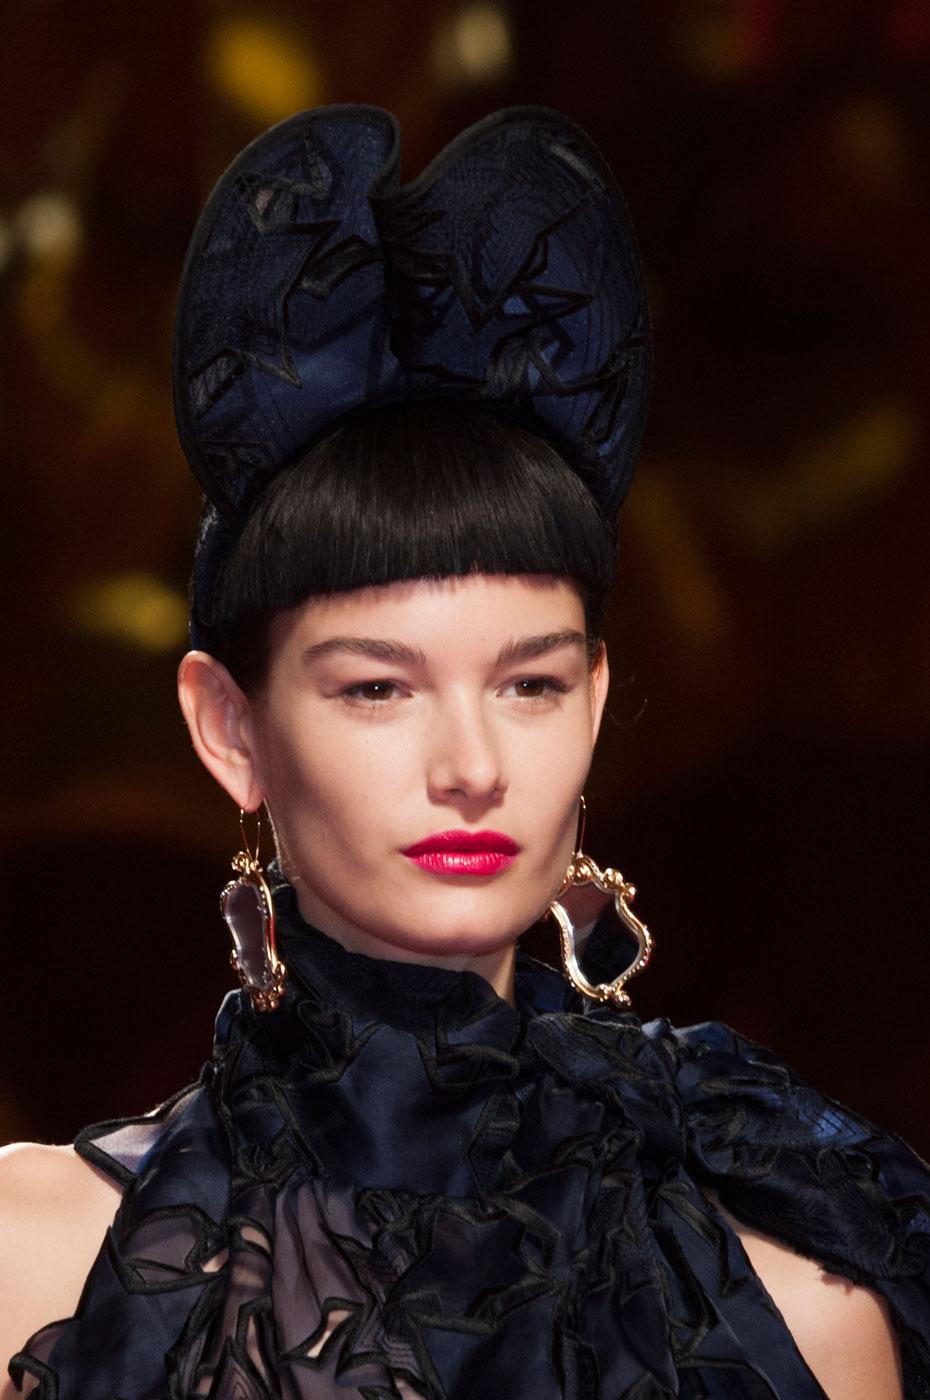 Schiaparelli-fashion-runway-show-close-ups-haute-couture-paris-spring-summer-2015-the-impression-09